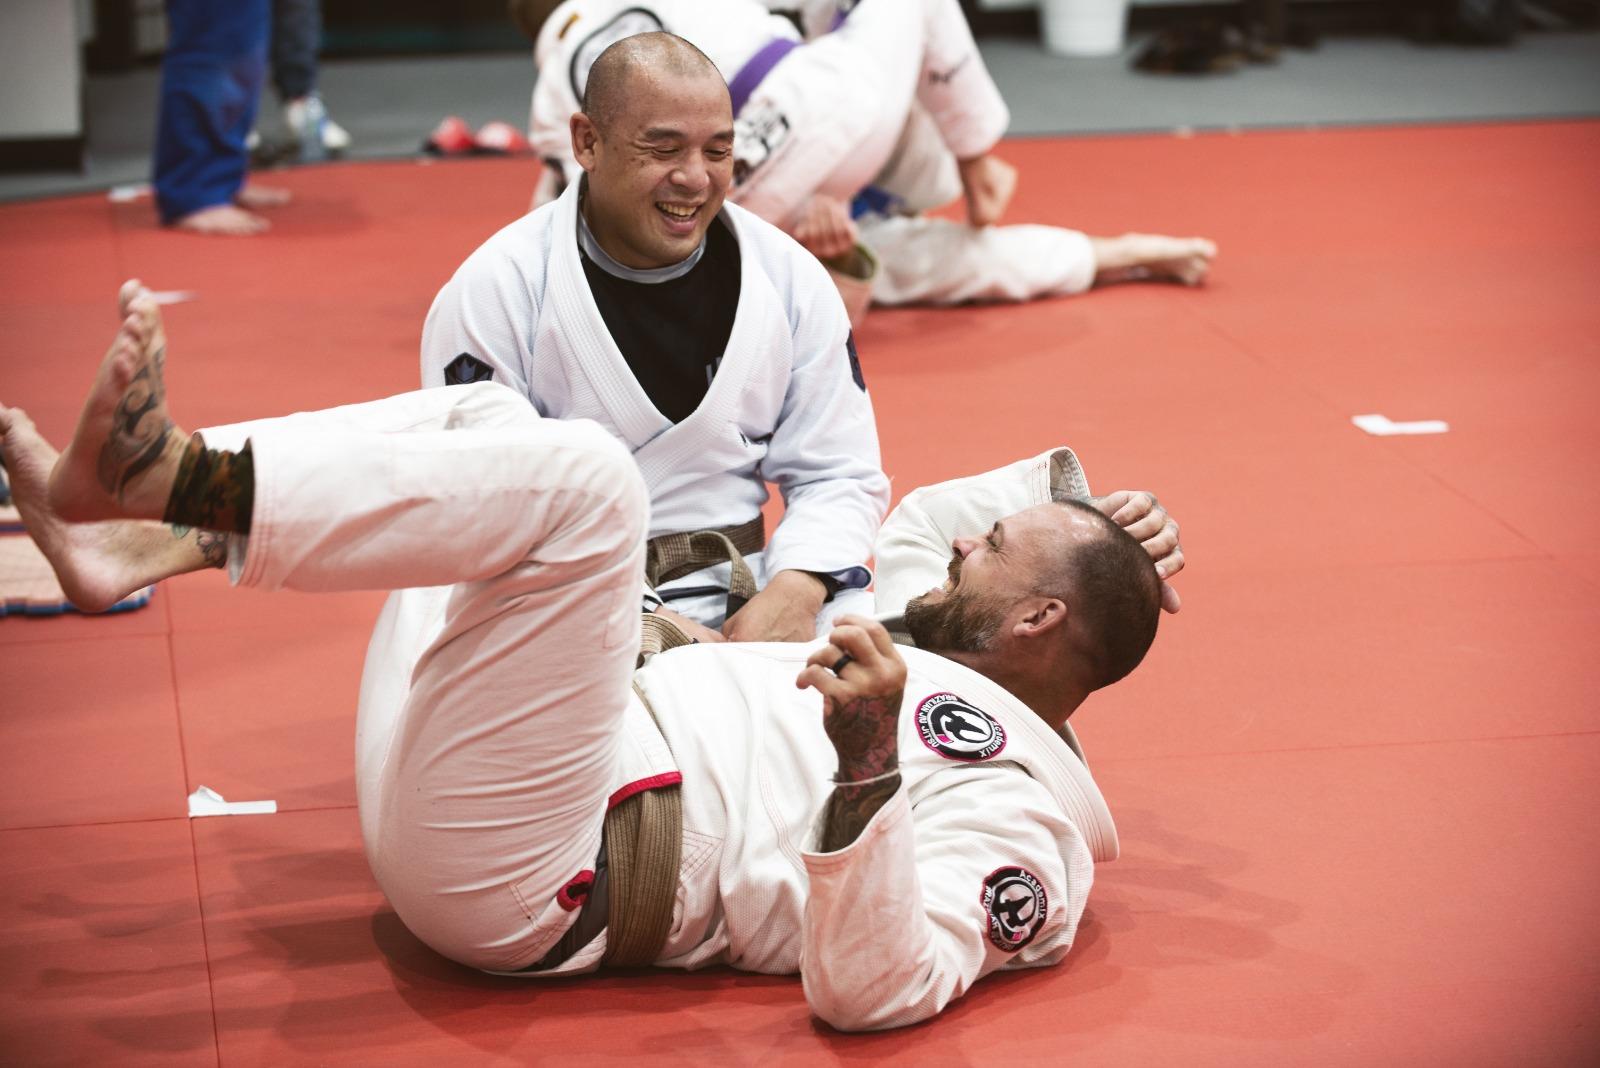 2 martial artists having fun training